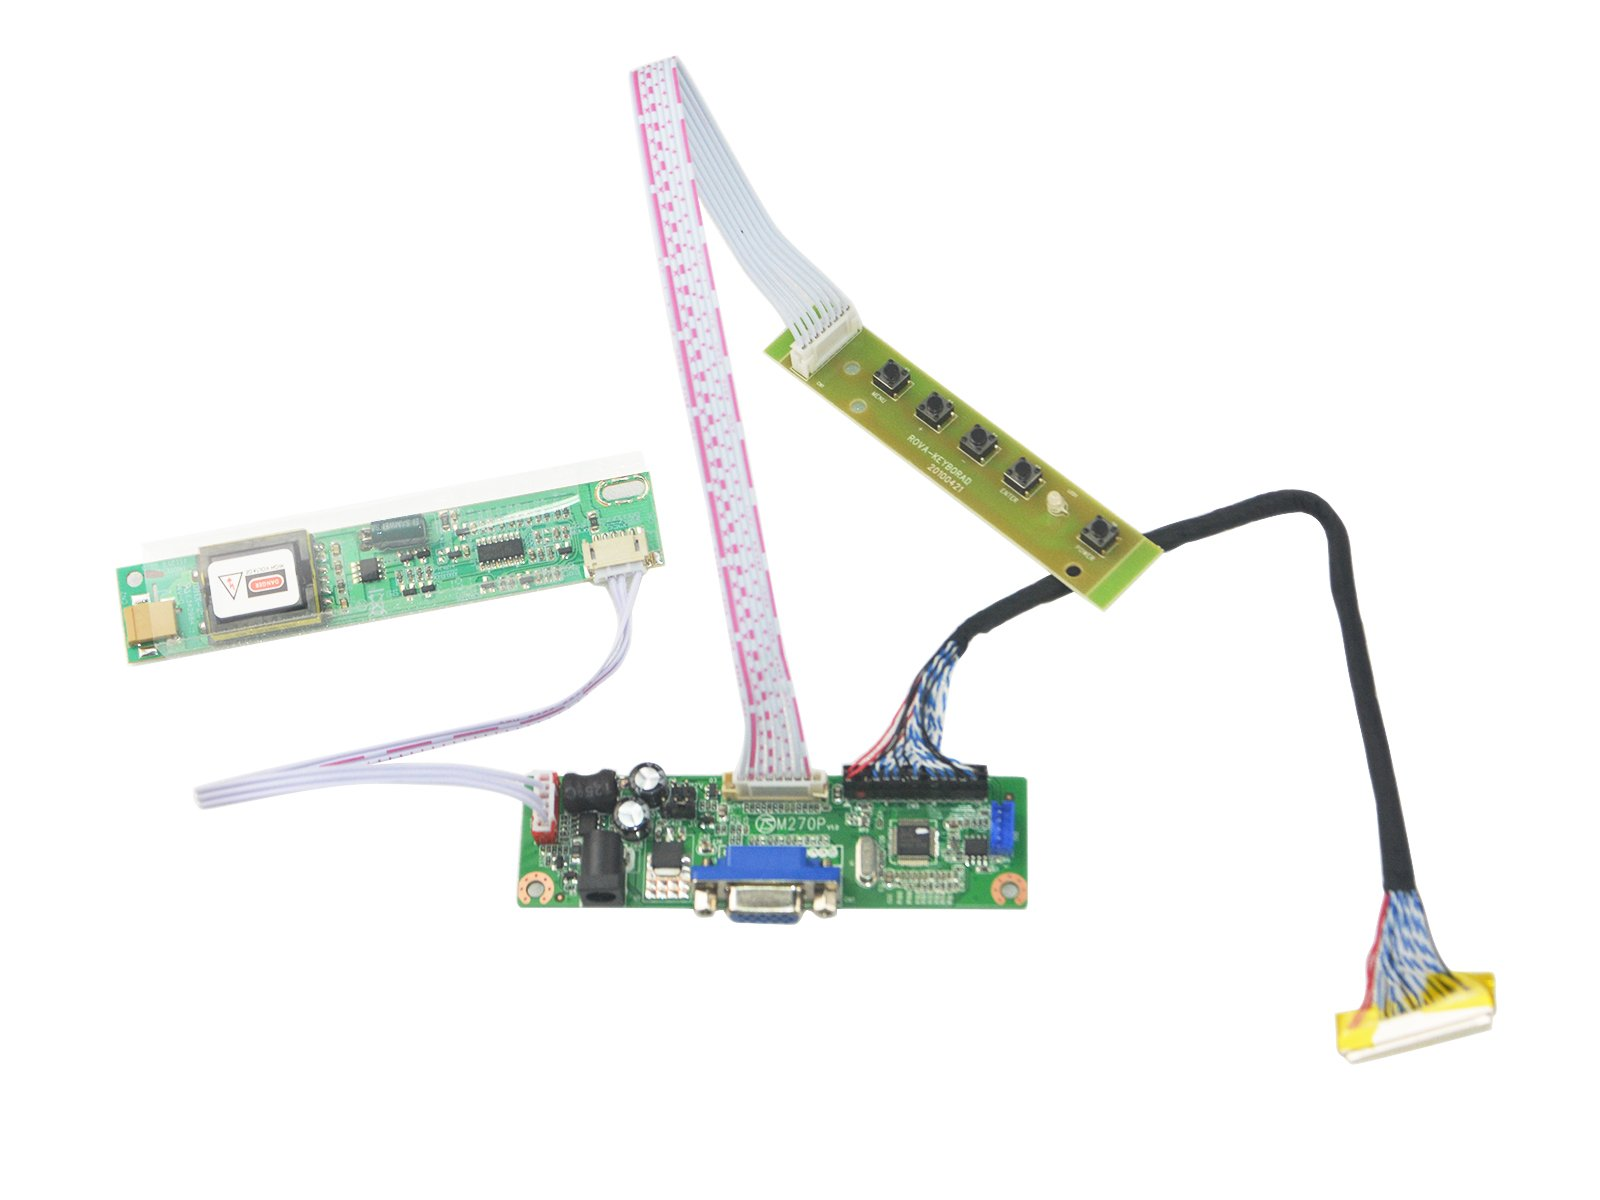 NJYTouch V.M70A VGA Controller Board Kit LVDS Driver For LP171WP4 LTN170WX-L05 LTN170WX-L03 LTN170X2-L02 LCD Screen by NJYTouch (Image #1)